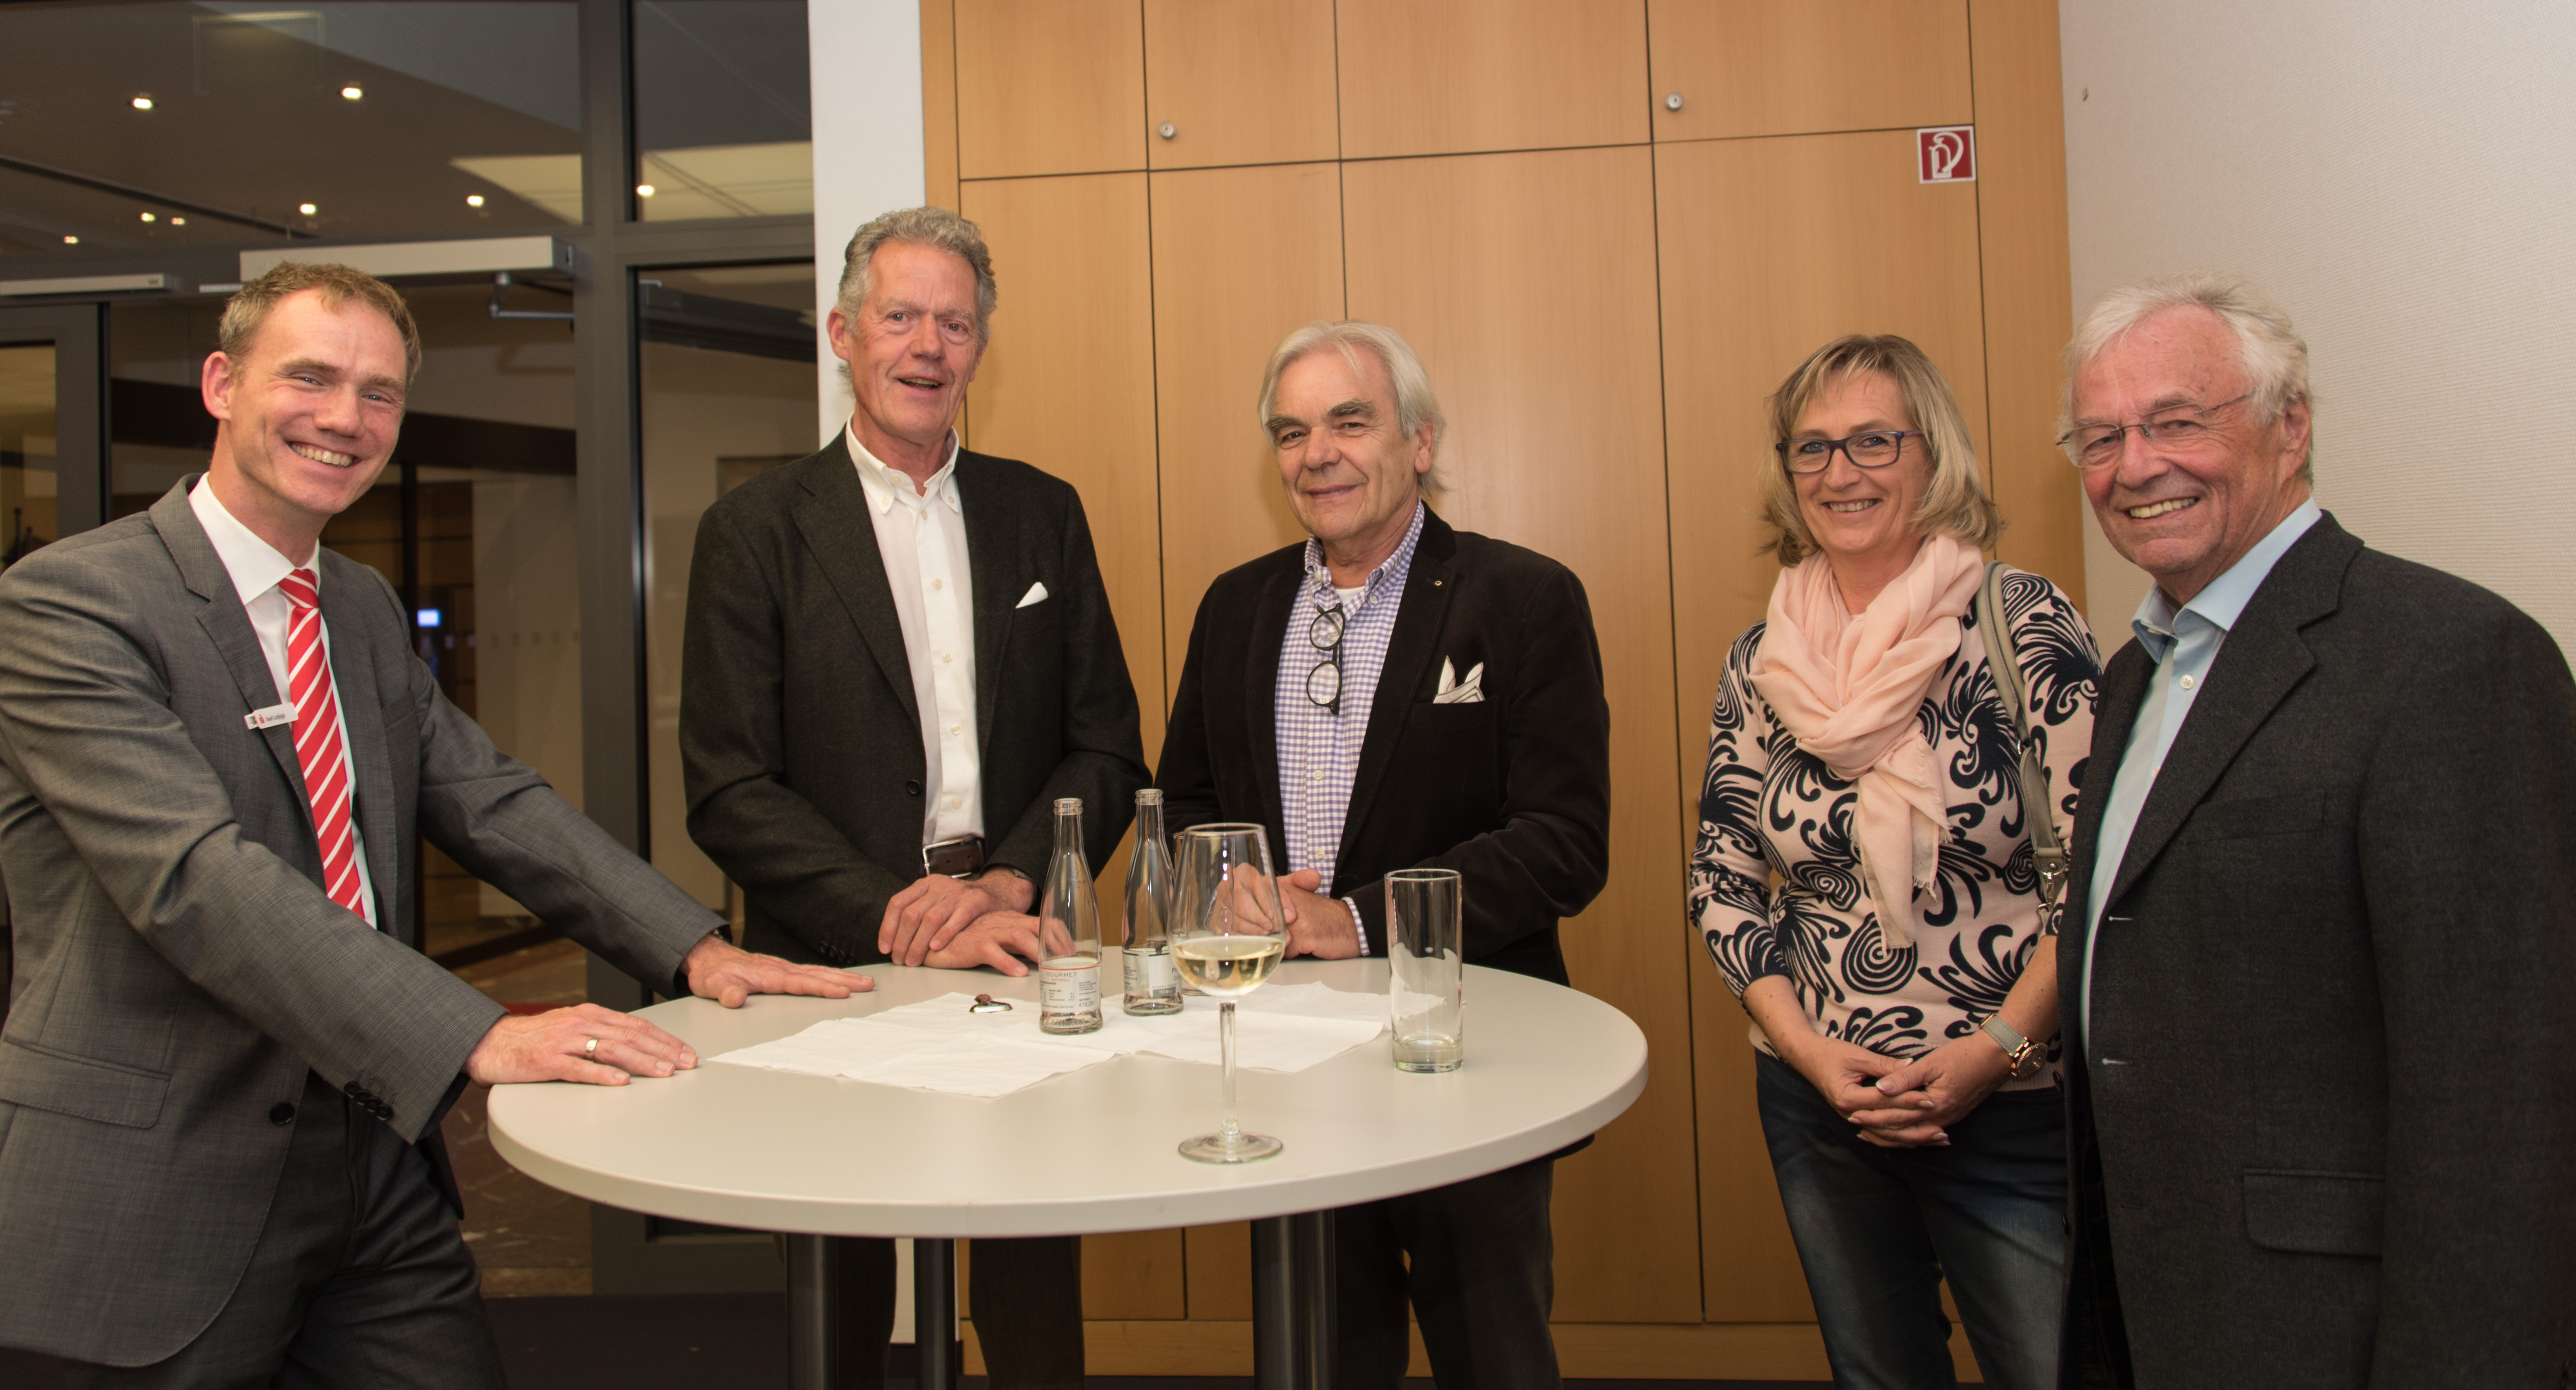 vl. Axel Lodyga, Gerd Sybrecht, Joachim Wegener, Gaby Keller, Rolf Range